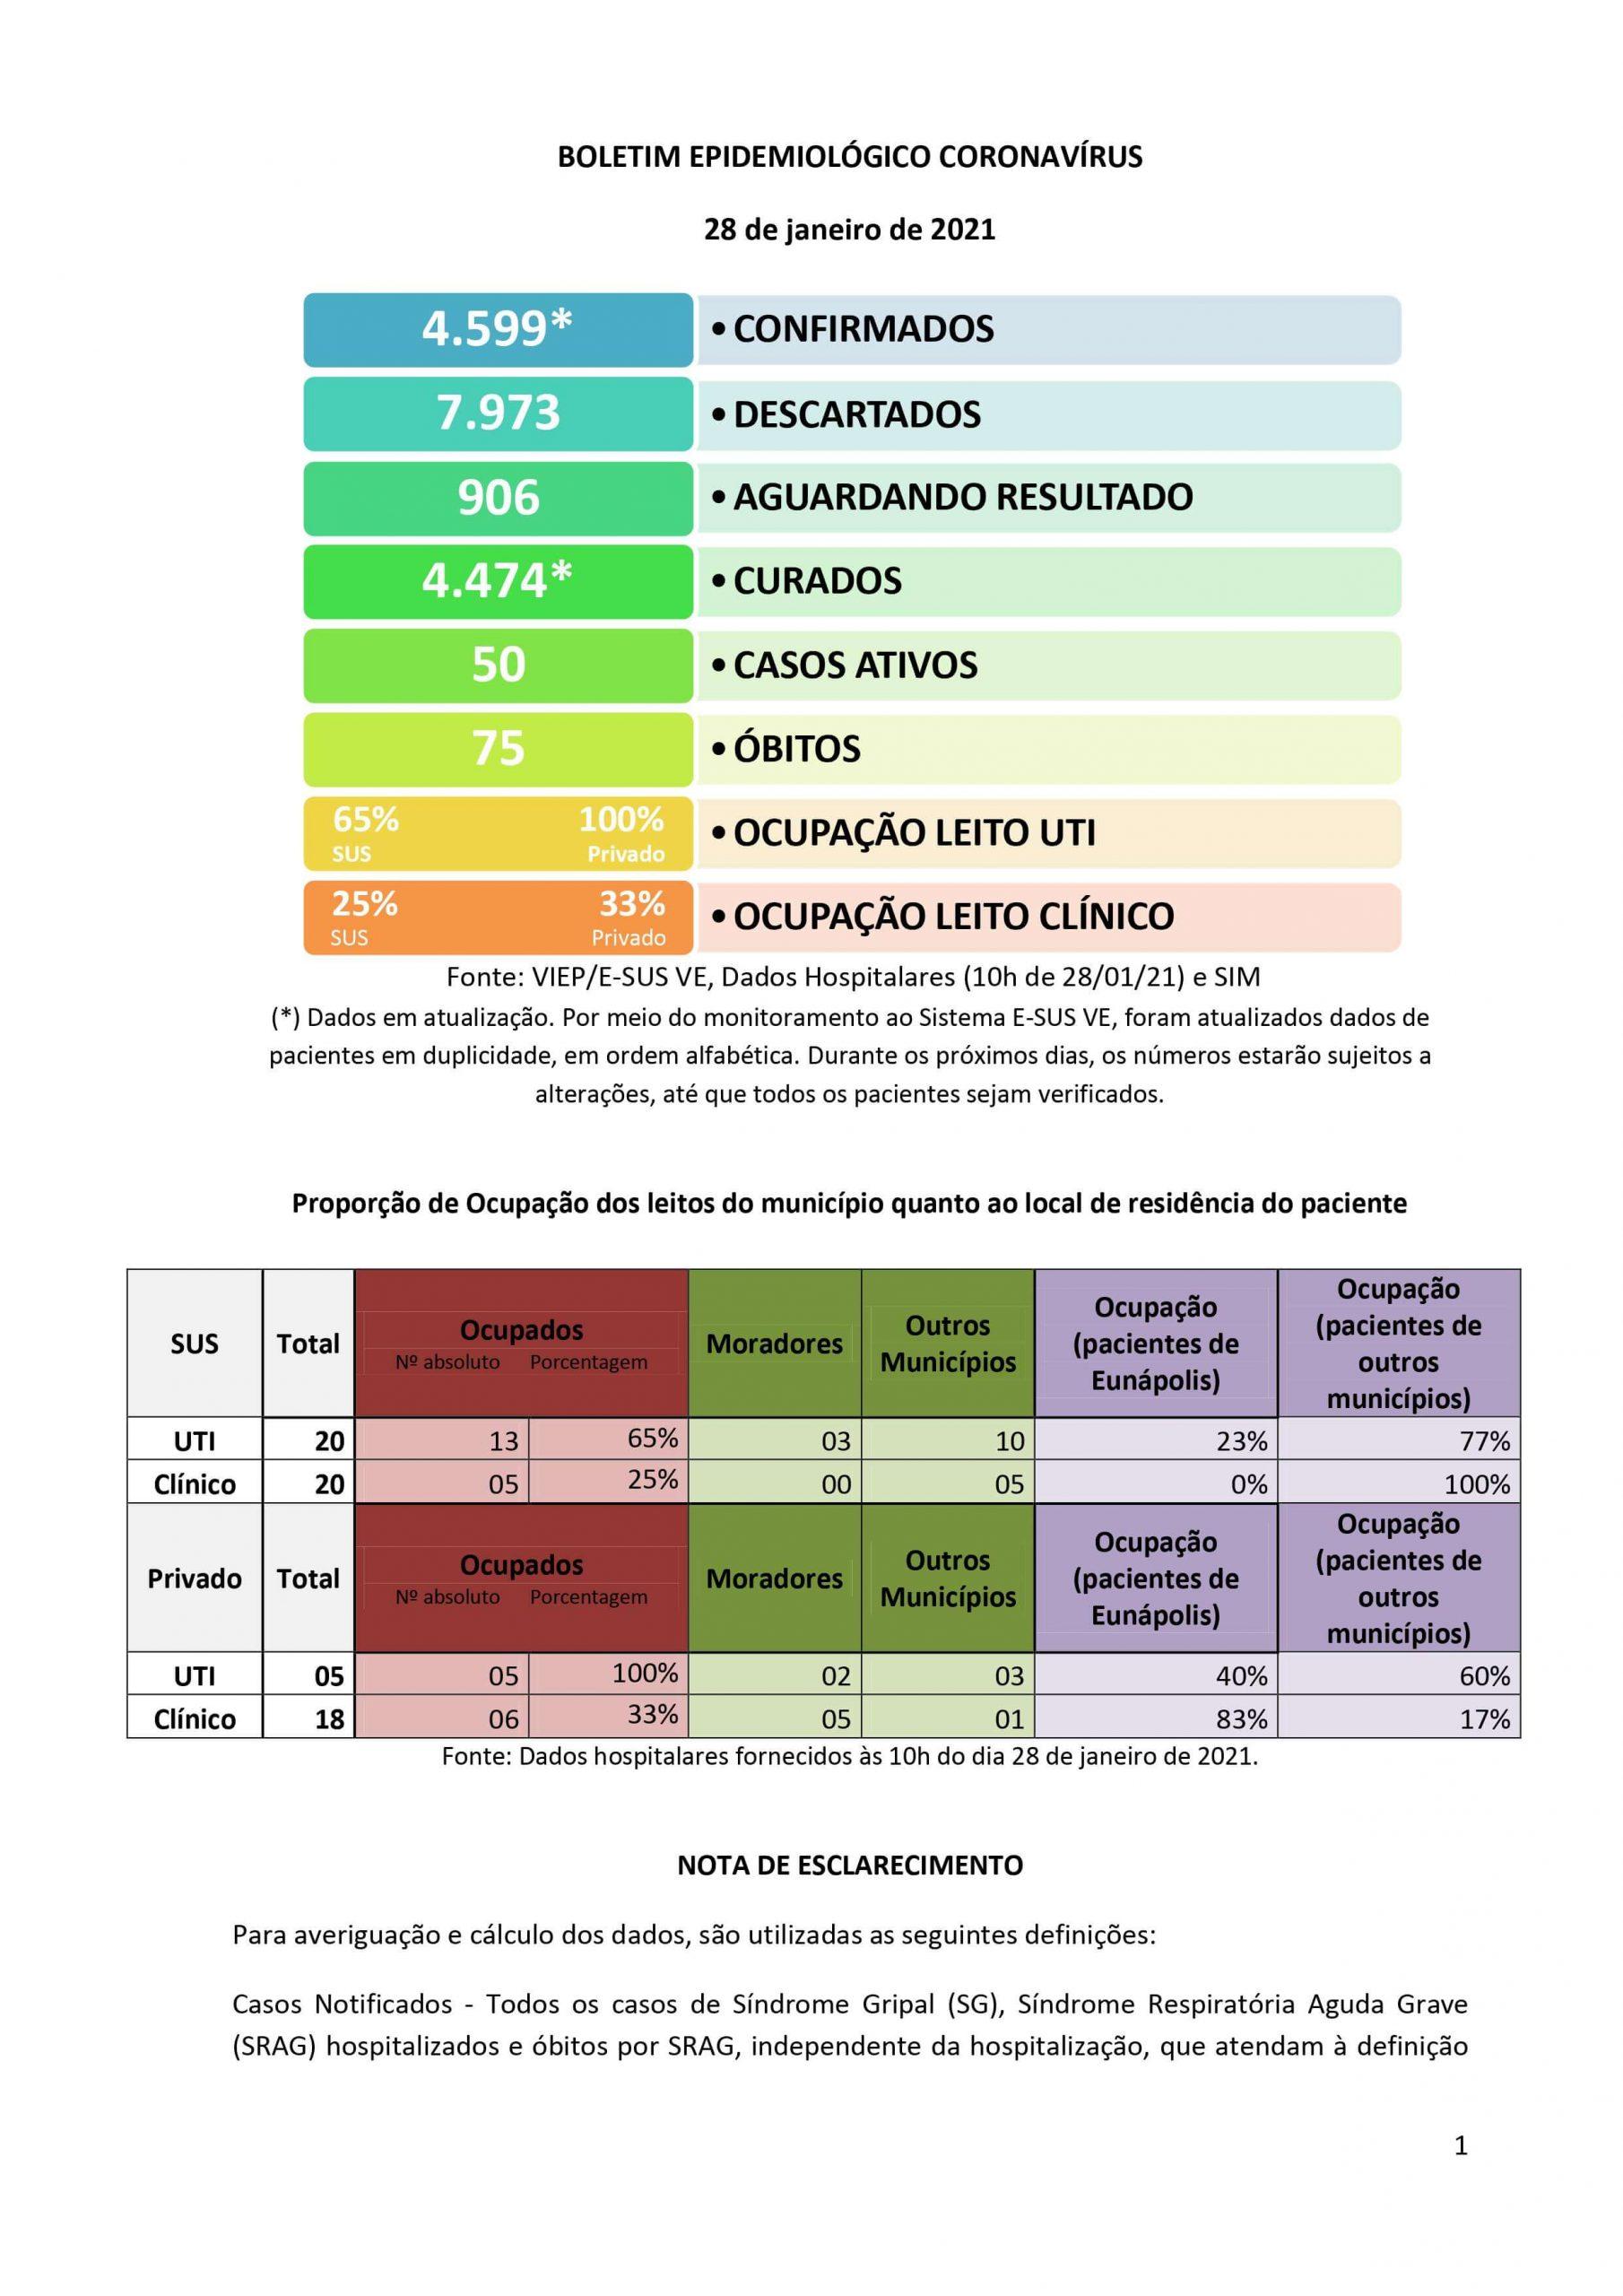 Boletim Epidemiológico Coronavírus do Município de Eunápolis para a data de hoje, 28/01/2021. 23